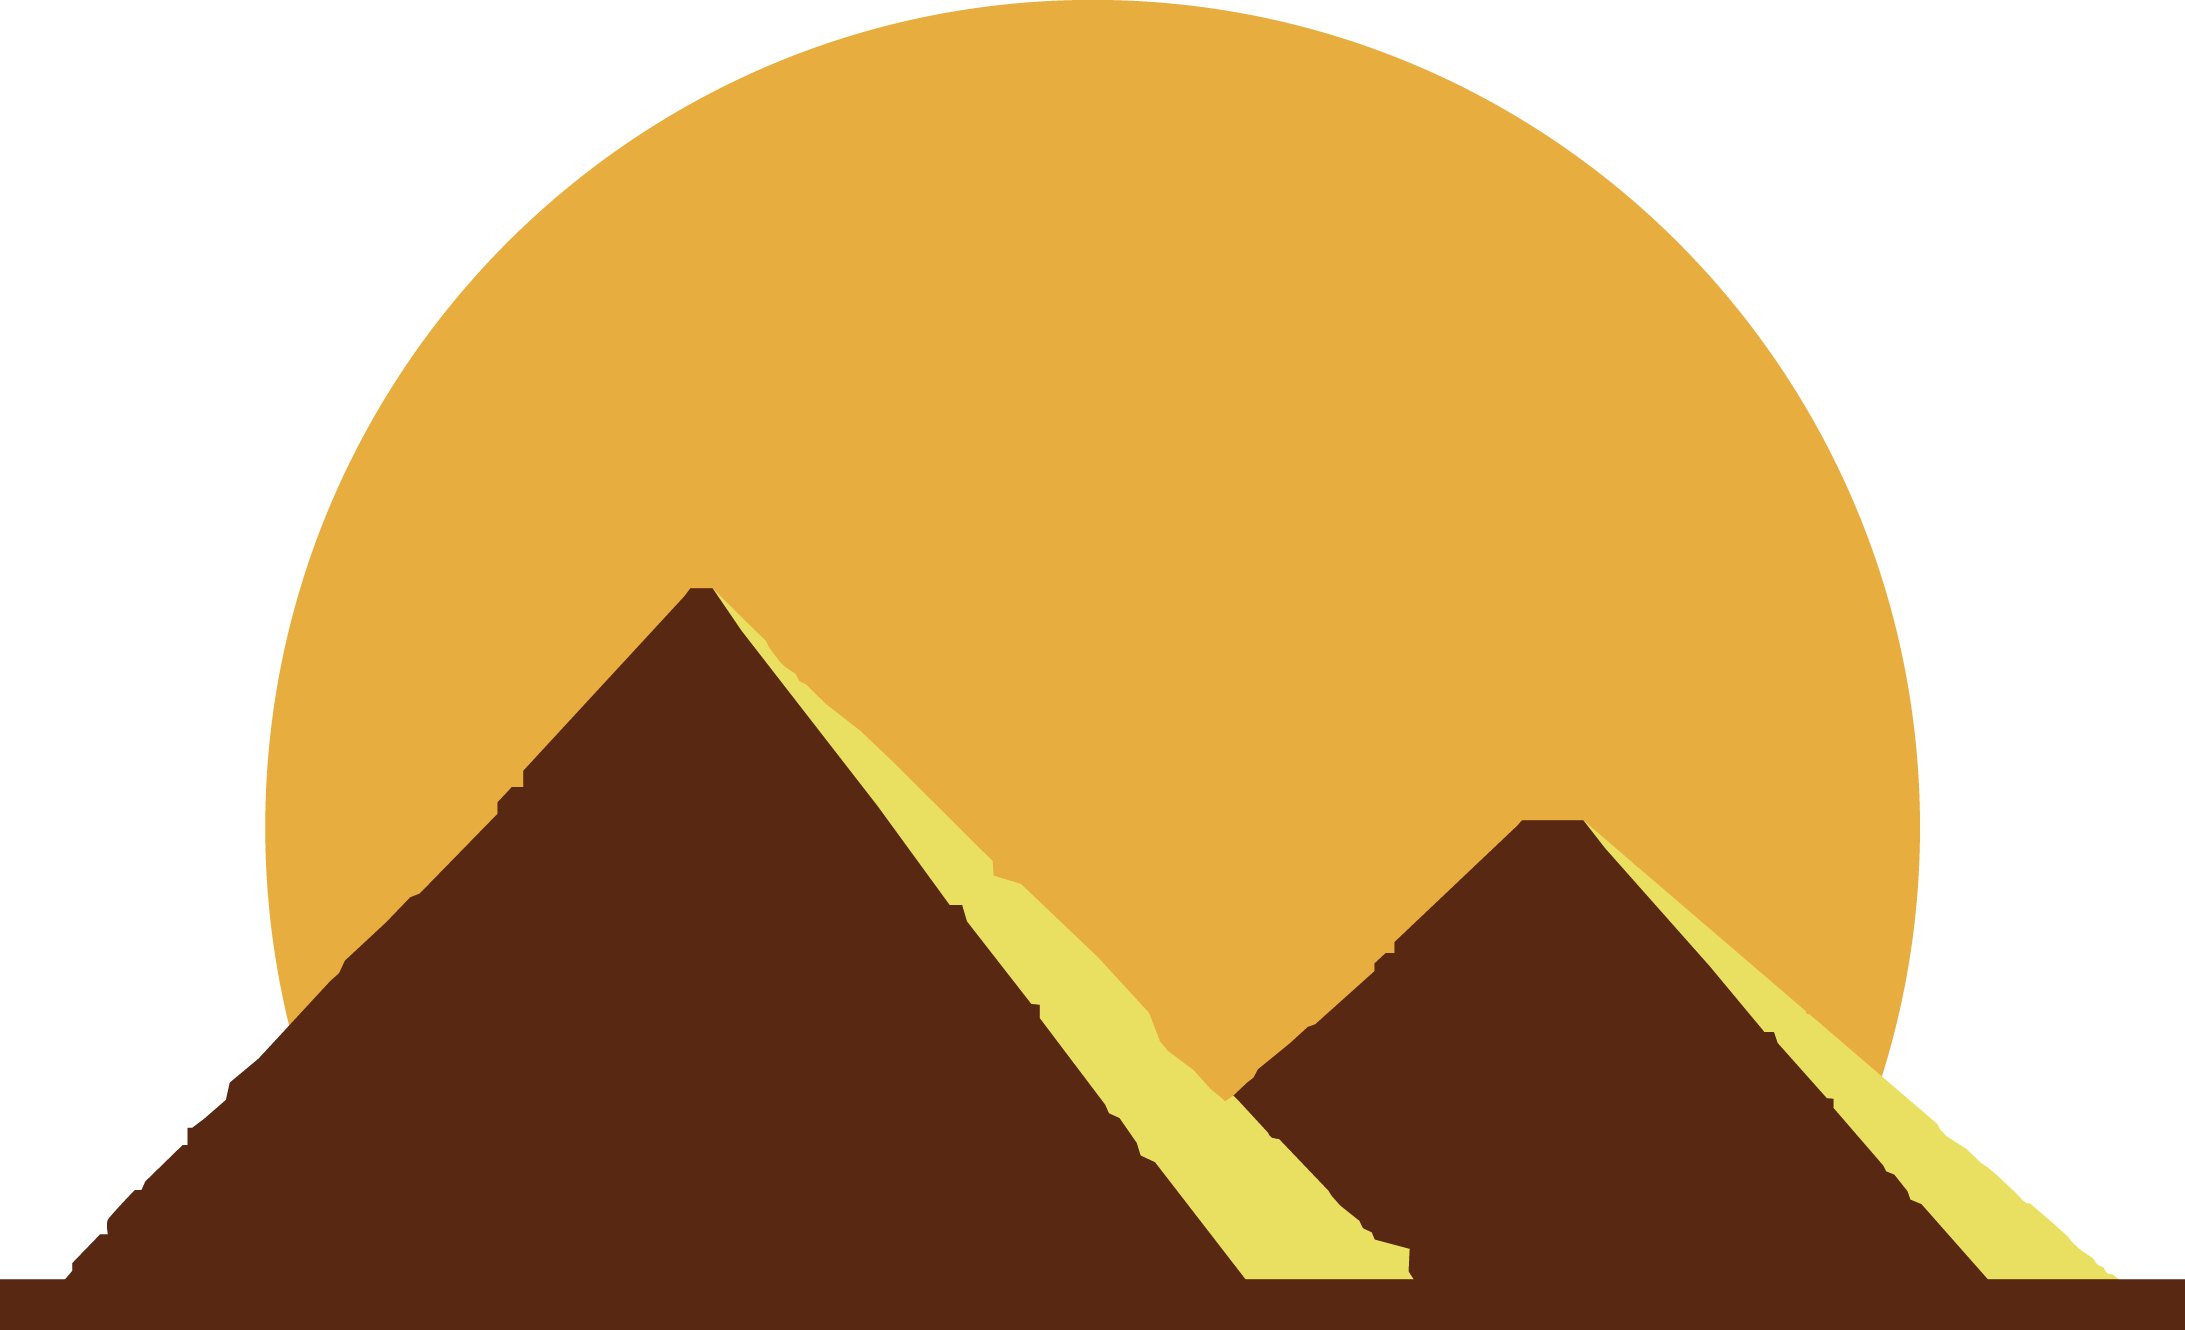 Egyptian pyramids ancient flat. Egypt clipart triangle pyramid